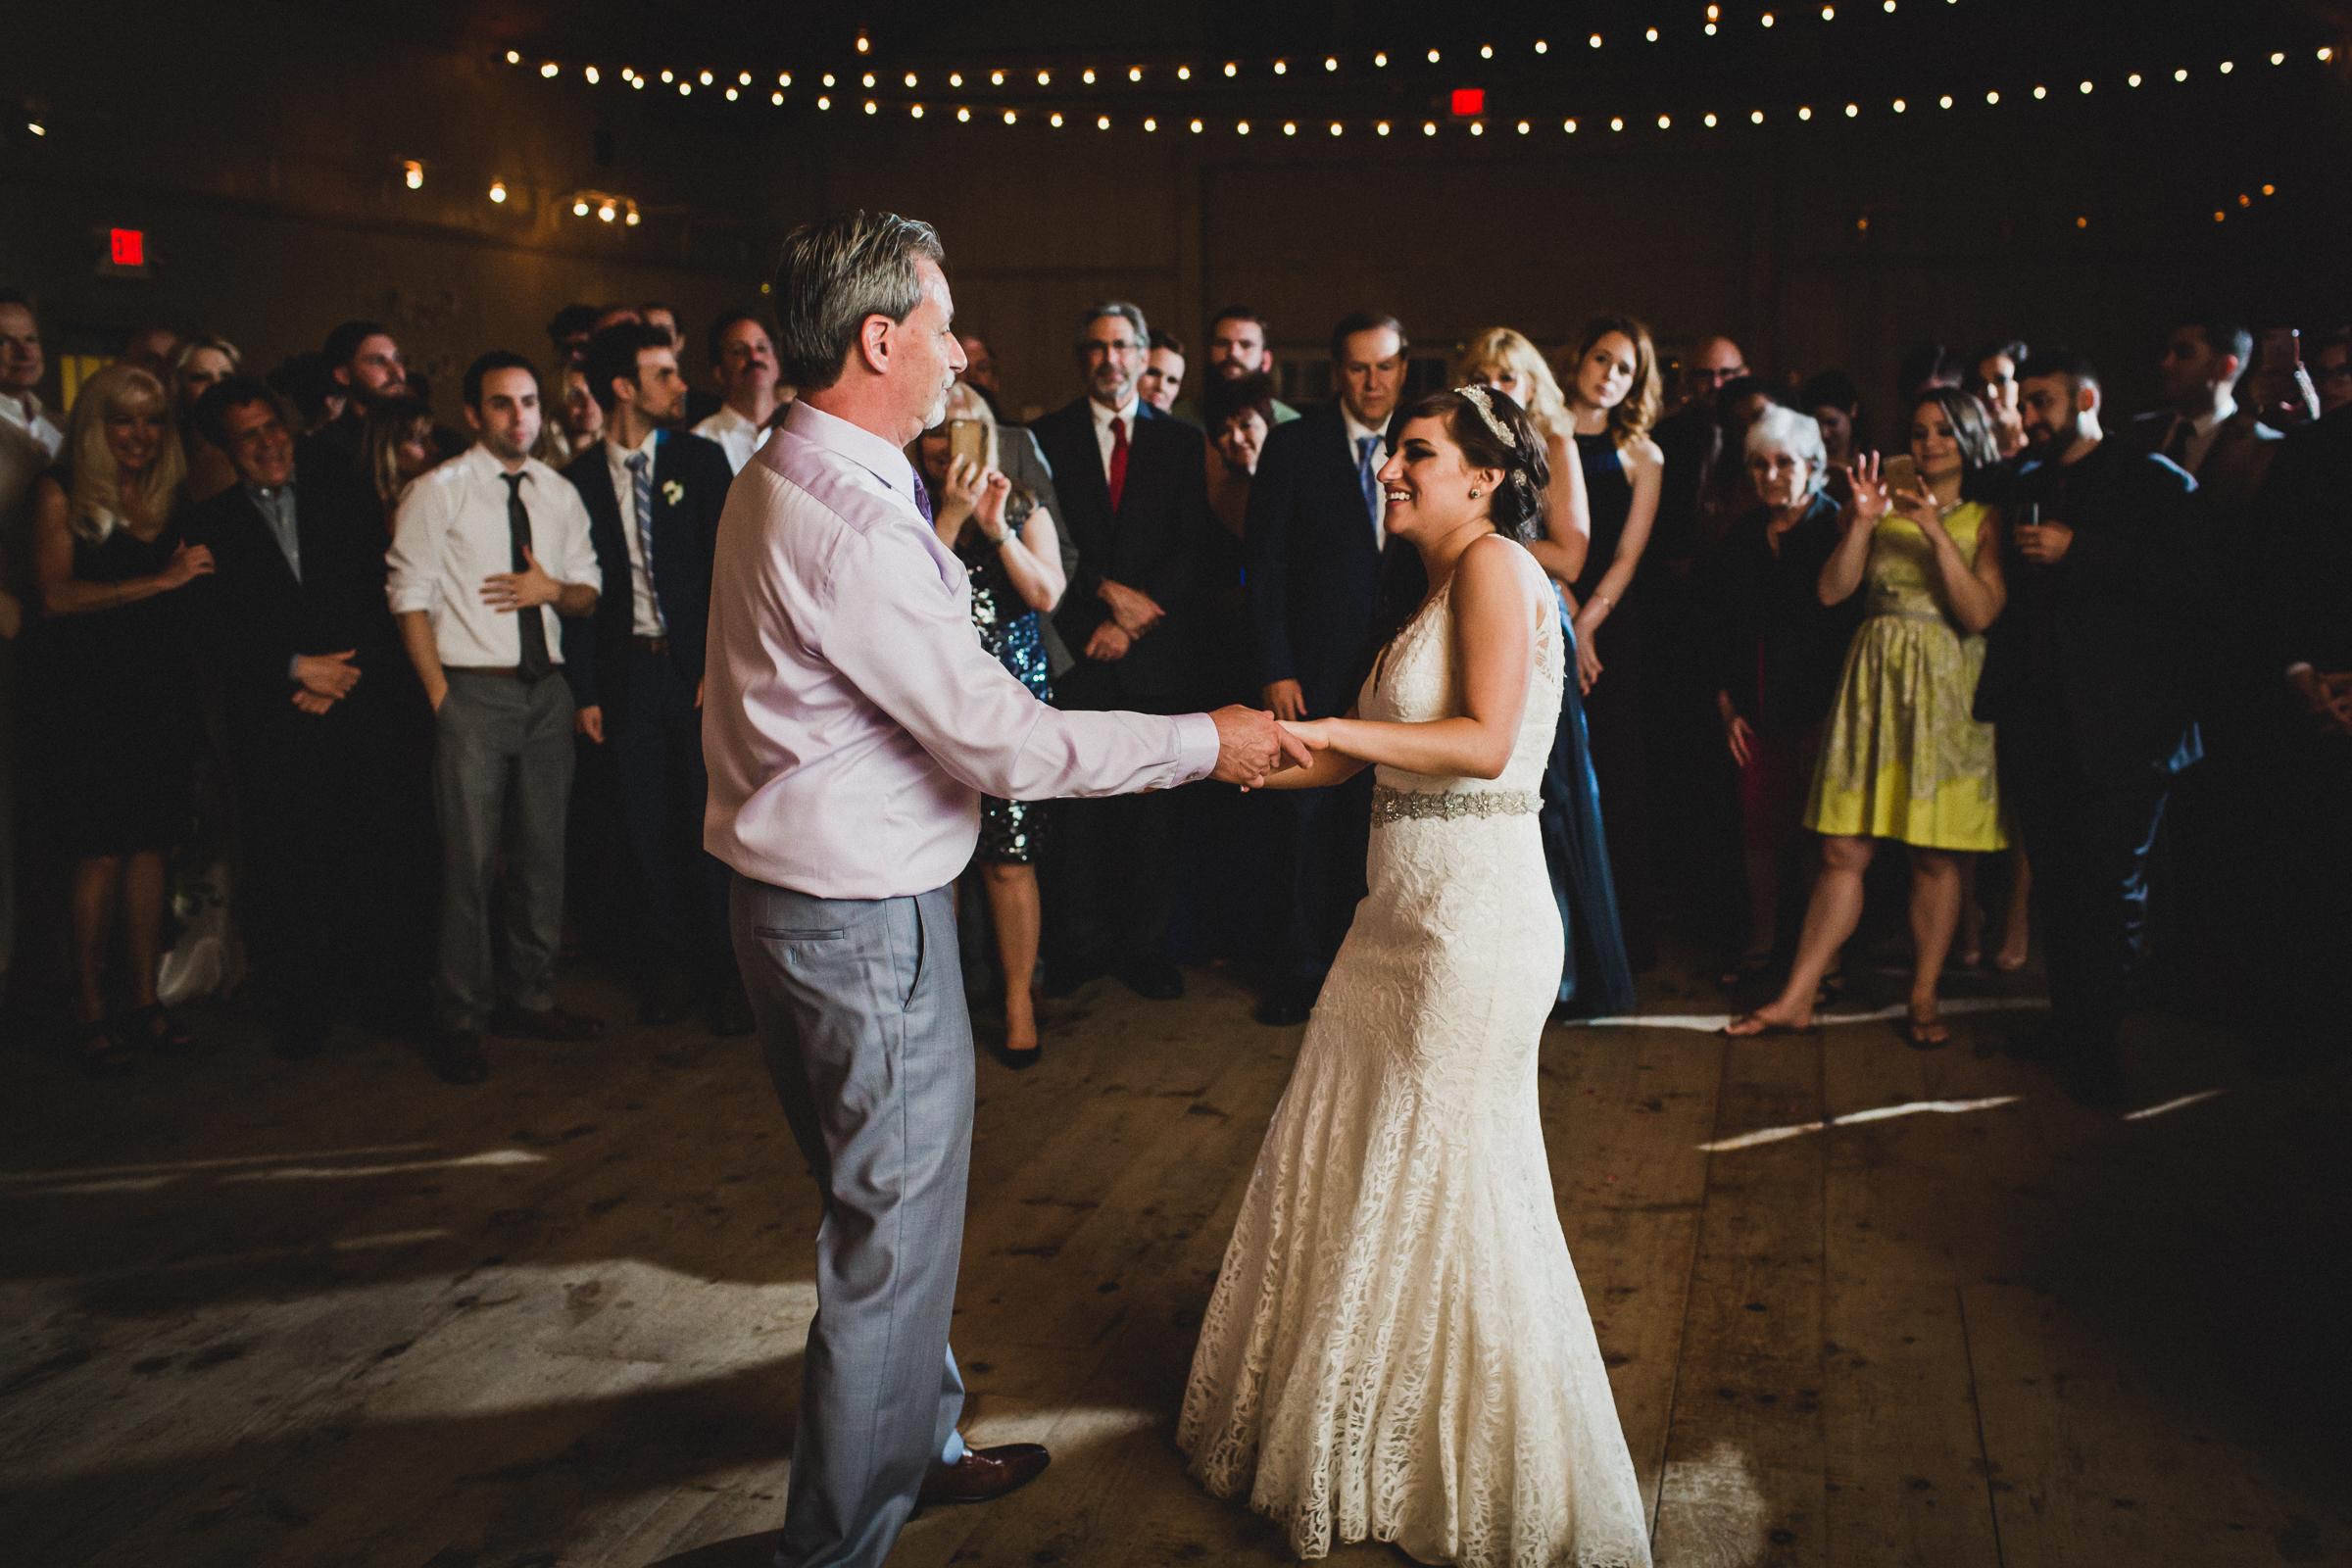 Martha-Clara-Vineyard-Long-Island-Documentary-Wedding-Photographer-94.jpg